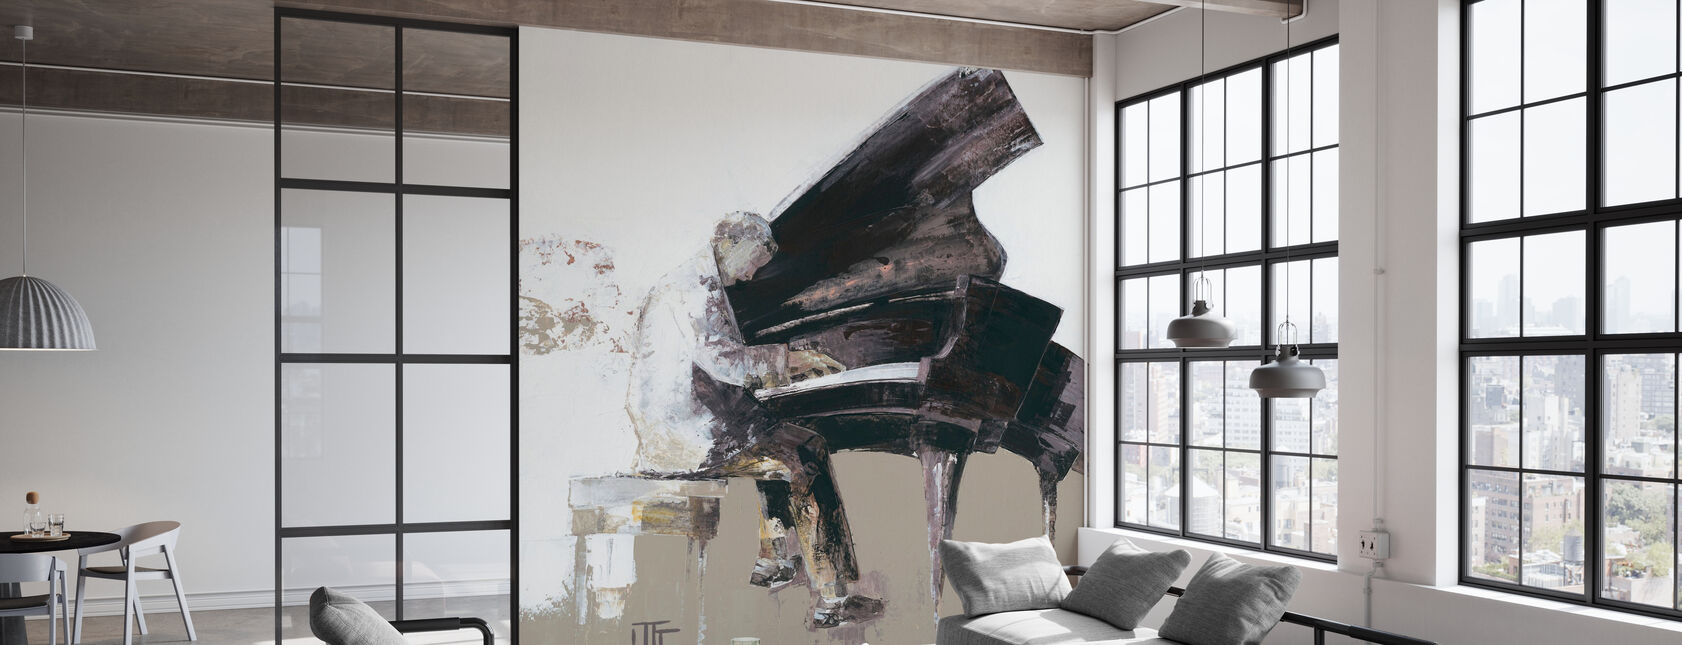 The Virtuose - Wallpaper - Office